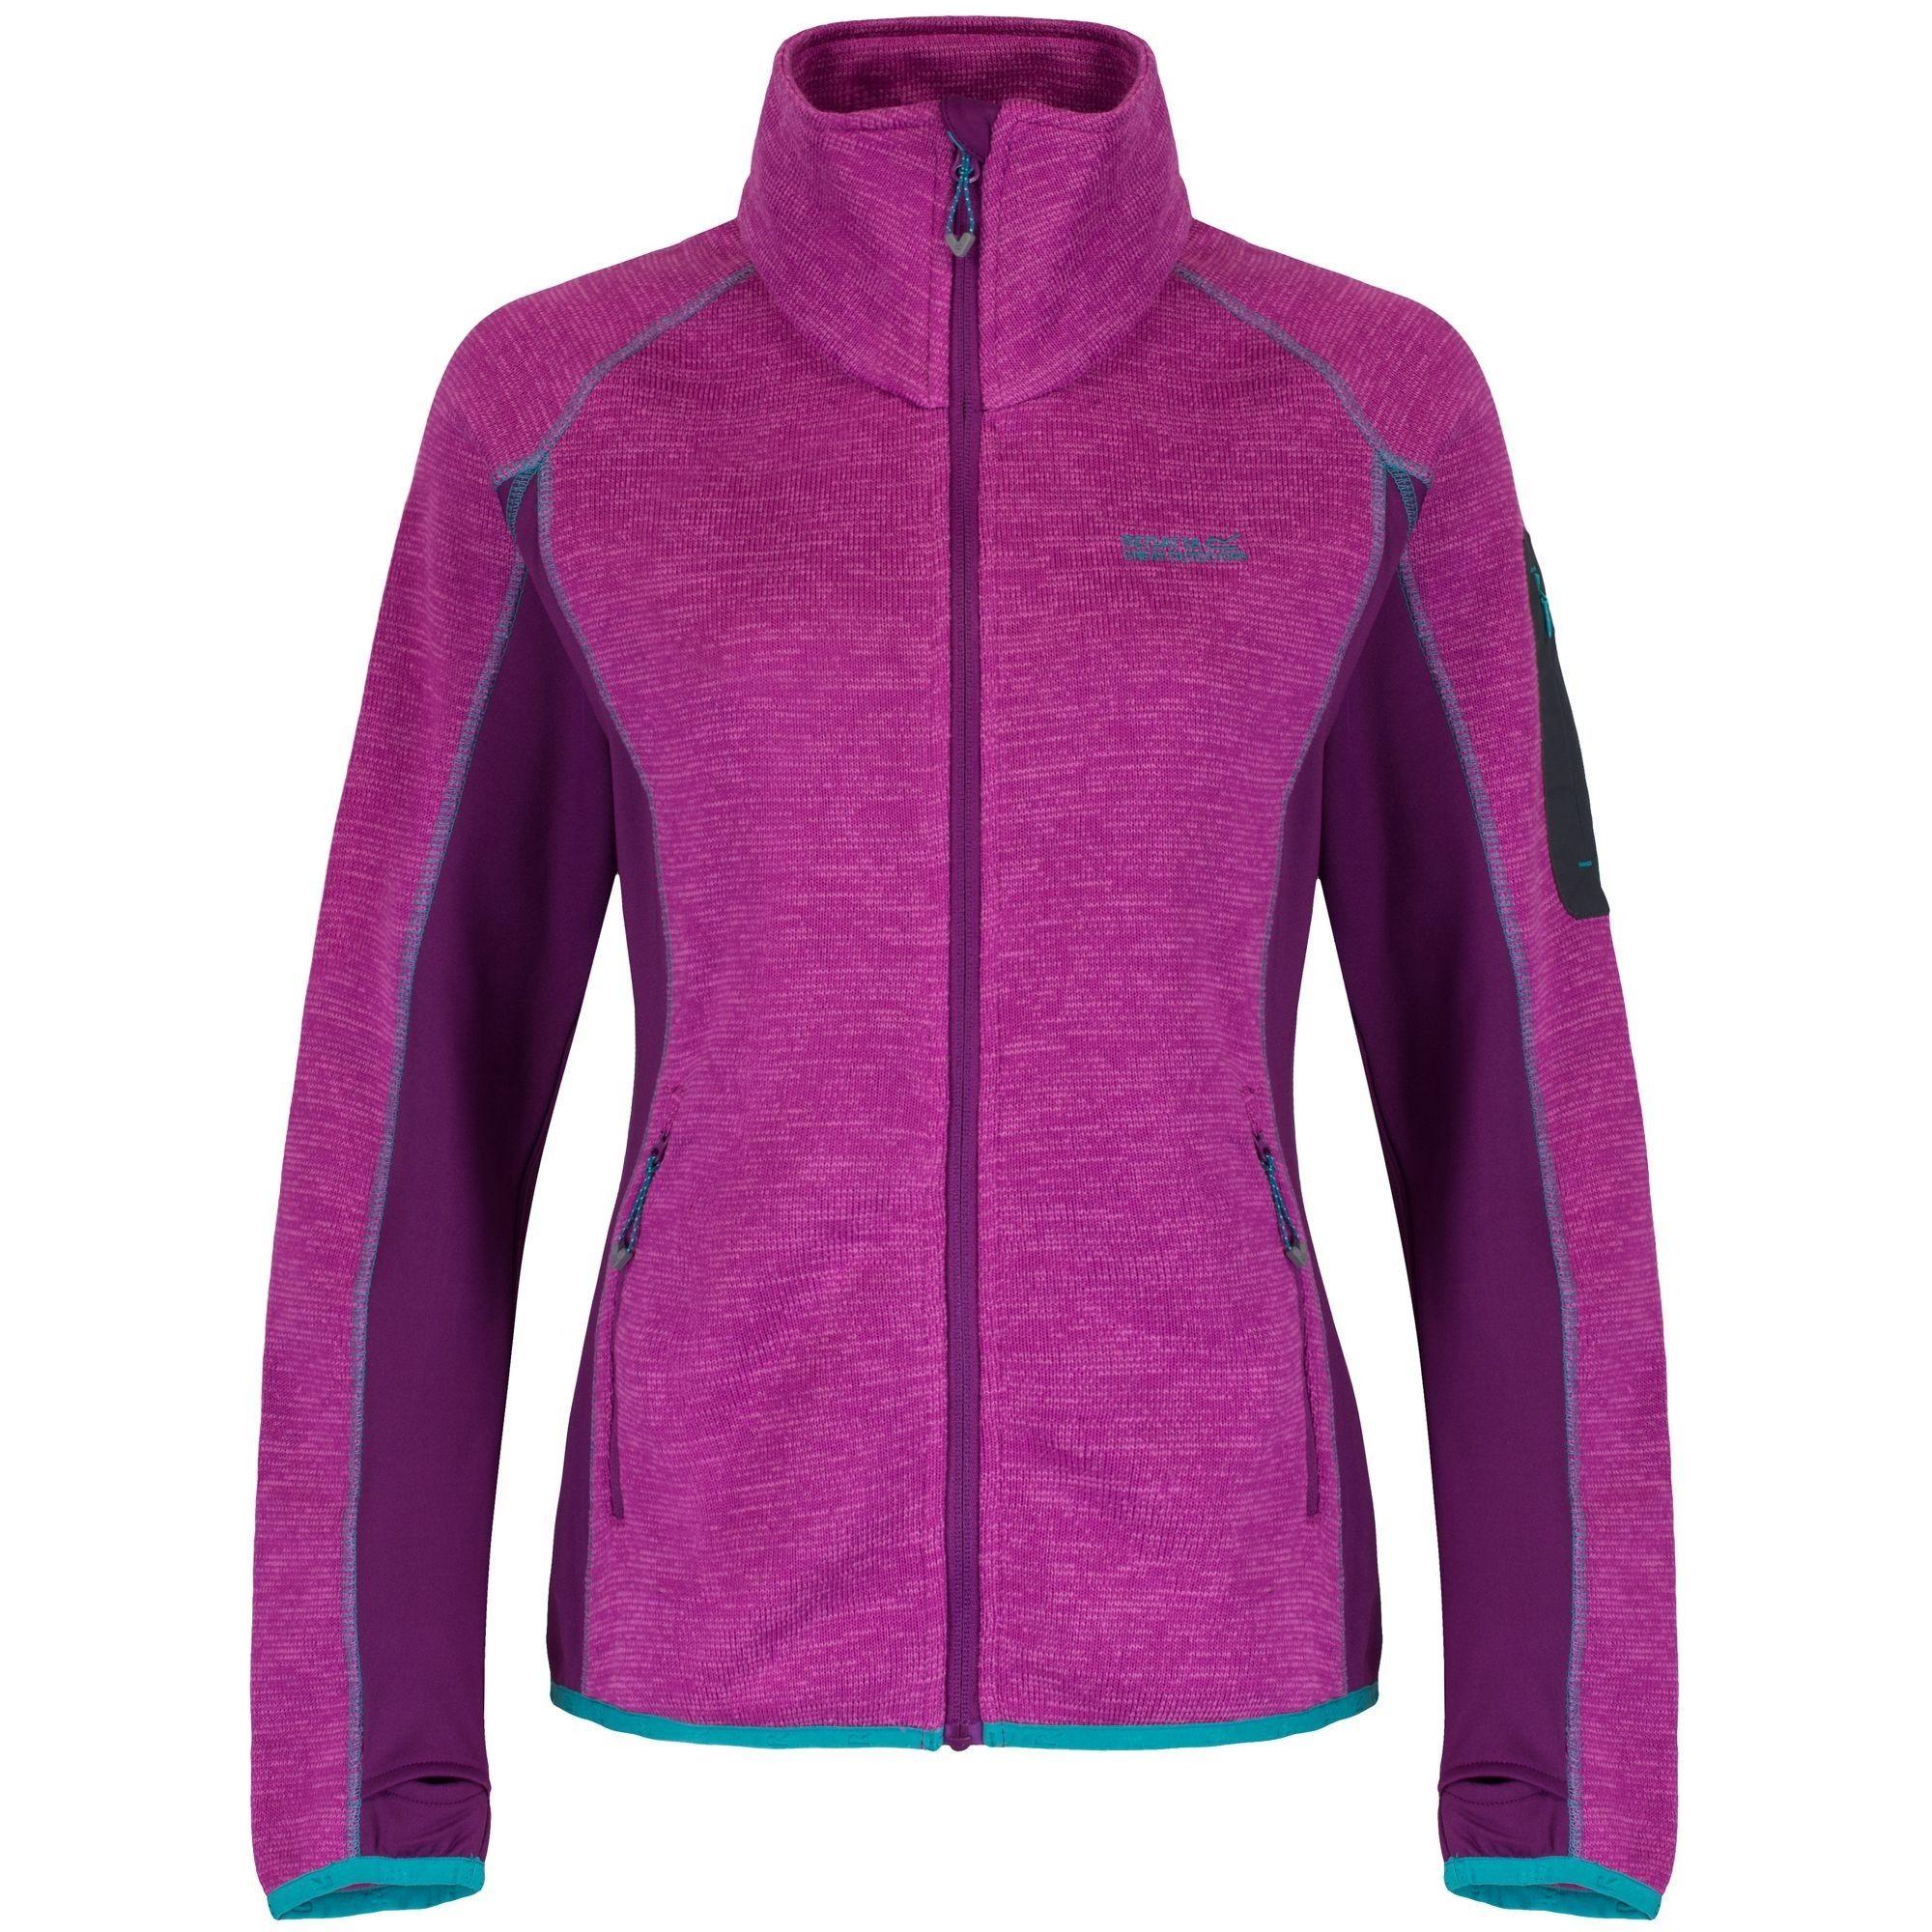 Regatta Great Outdoors Womens/Ladies Laney III Fleece Jacket (Vivid Viola/Winberry)